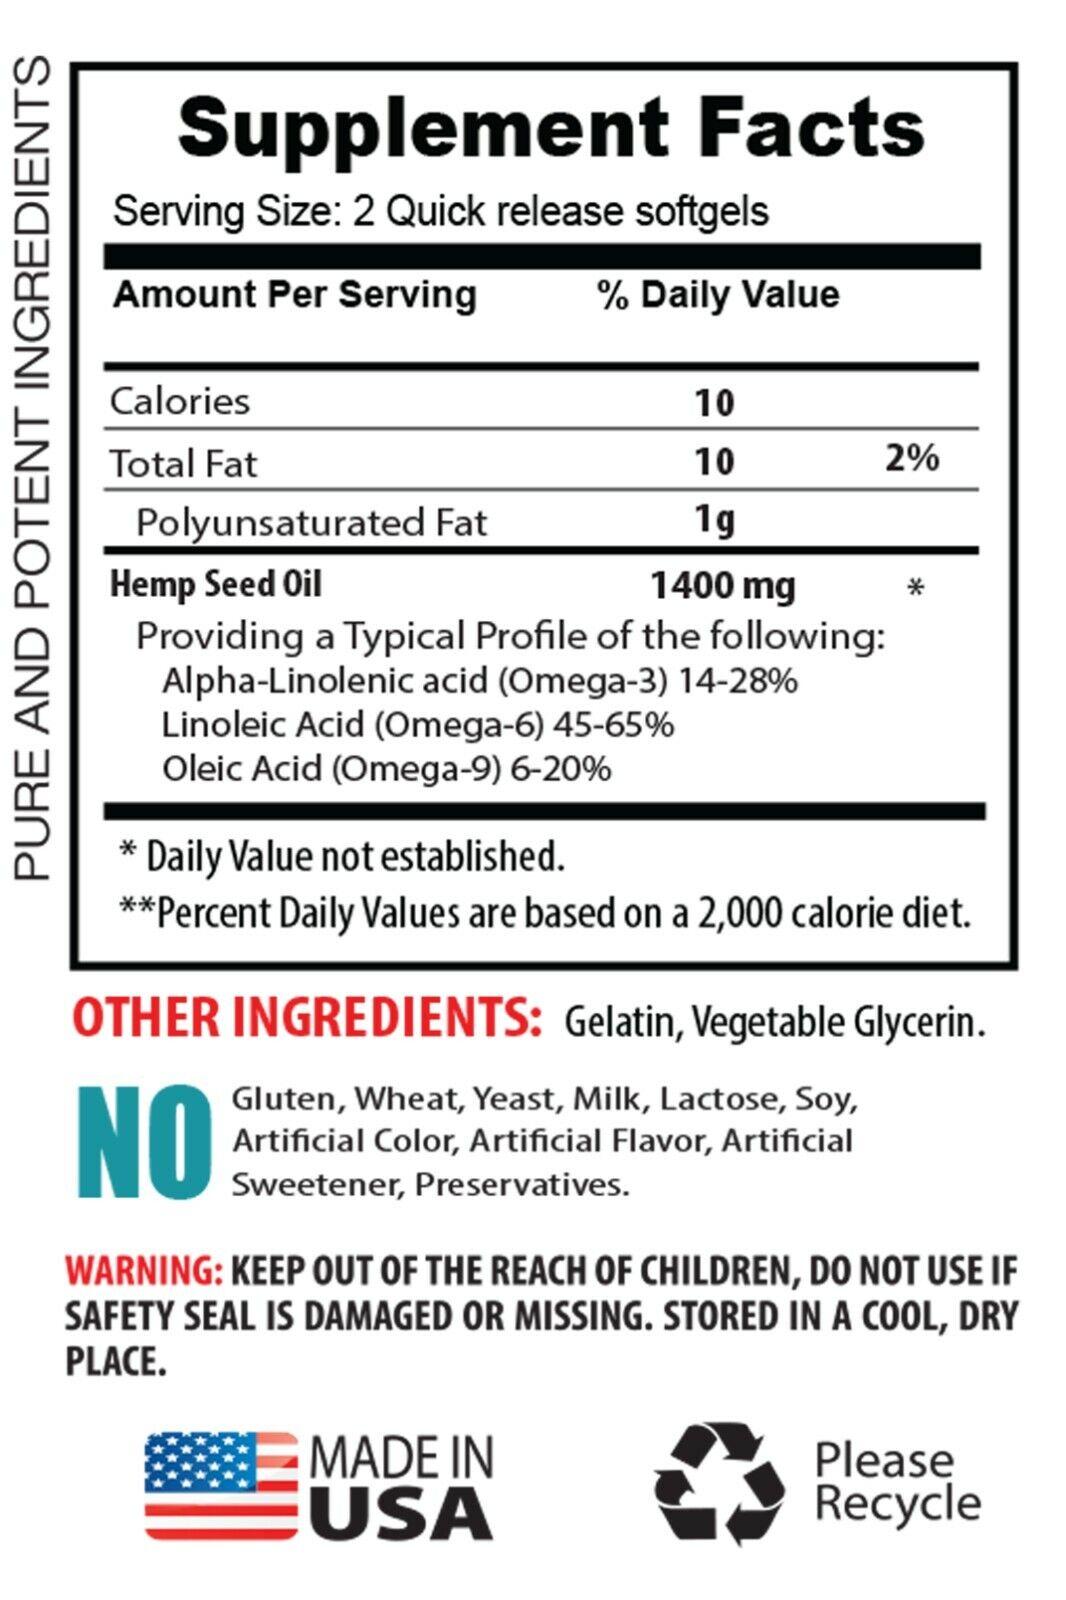 omega fatty acids, ORGANIC HEMP SEED OIL 1400mg, alpha linoleic acid 1B 1